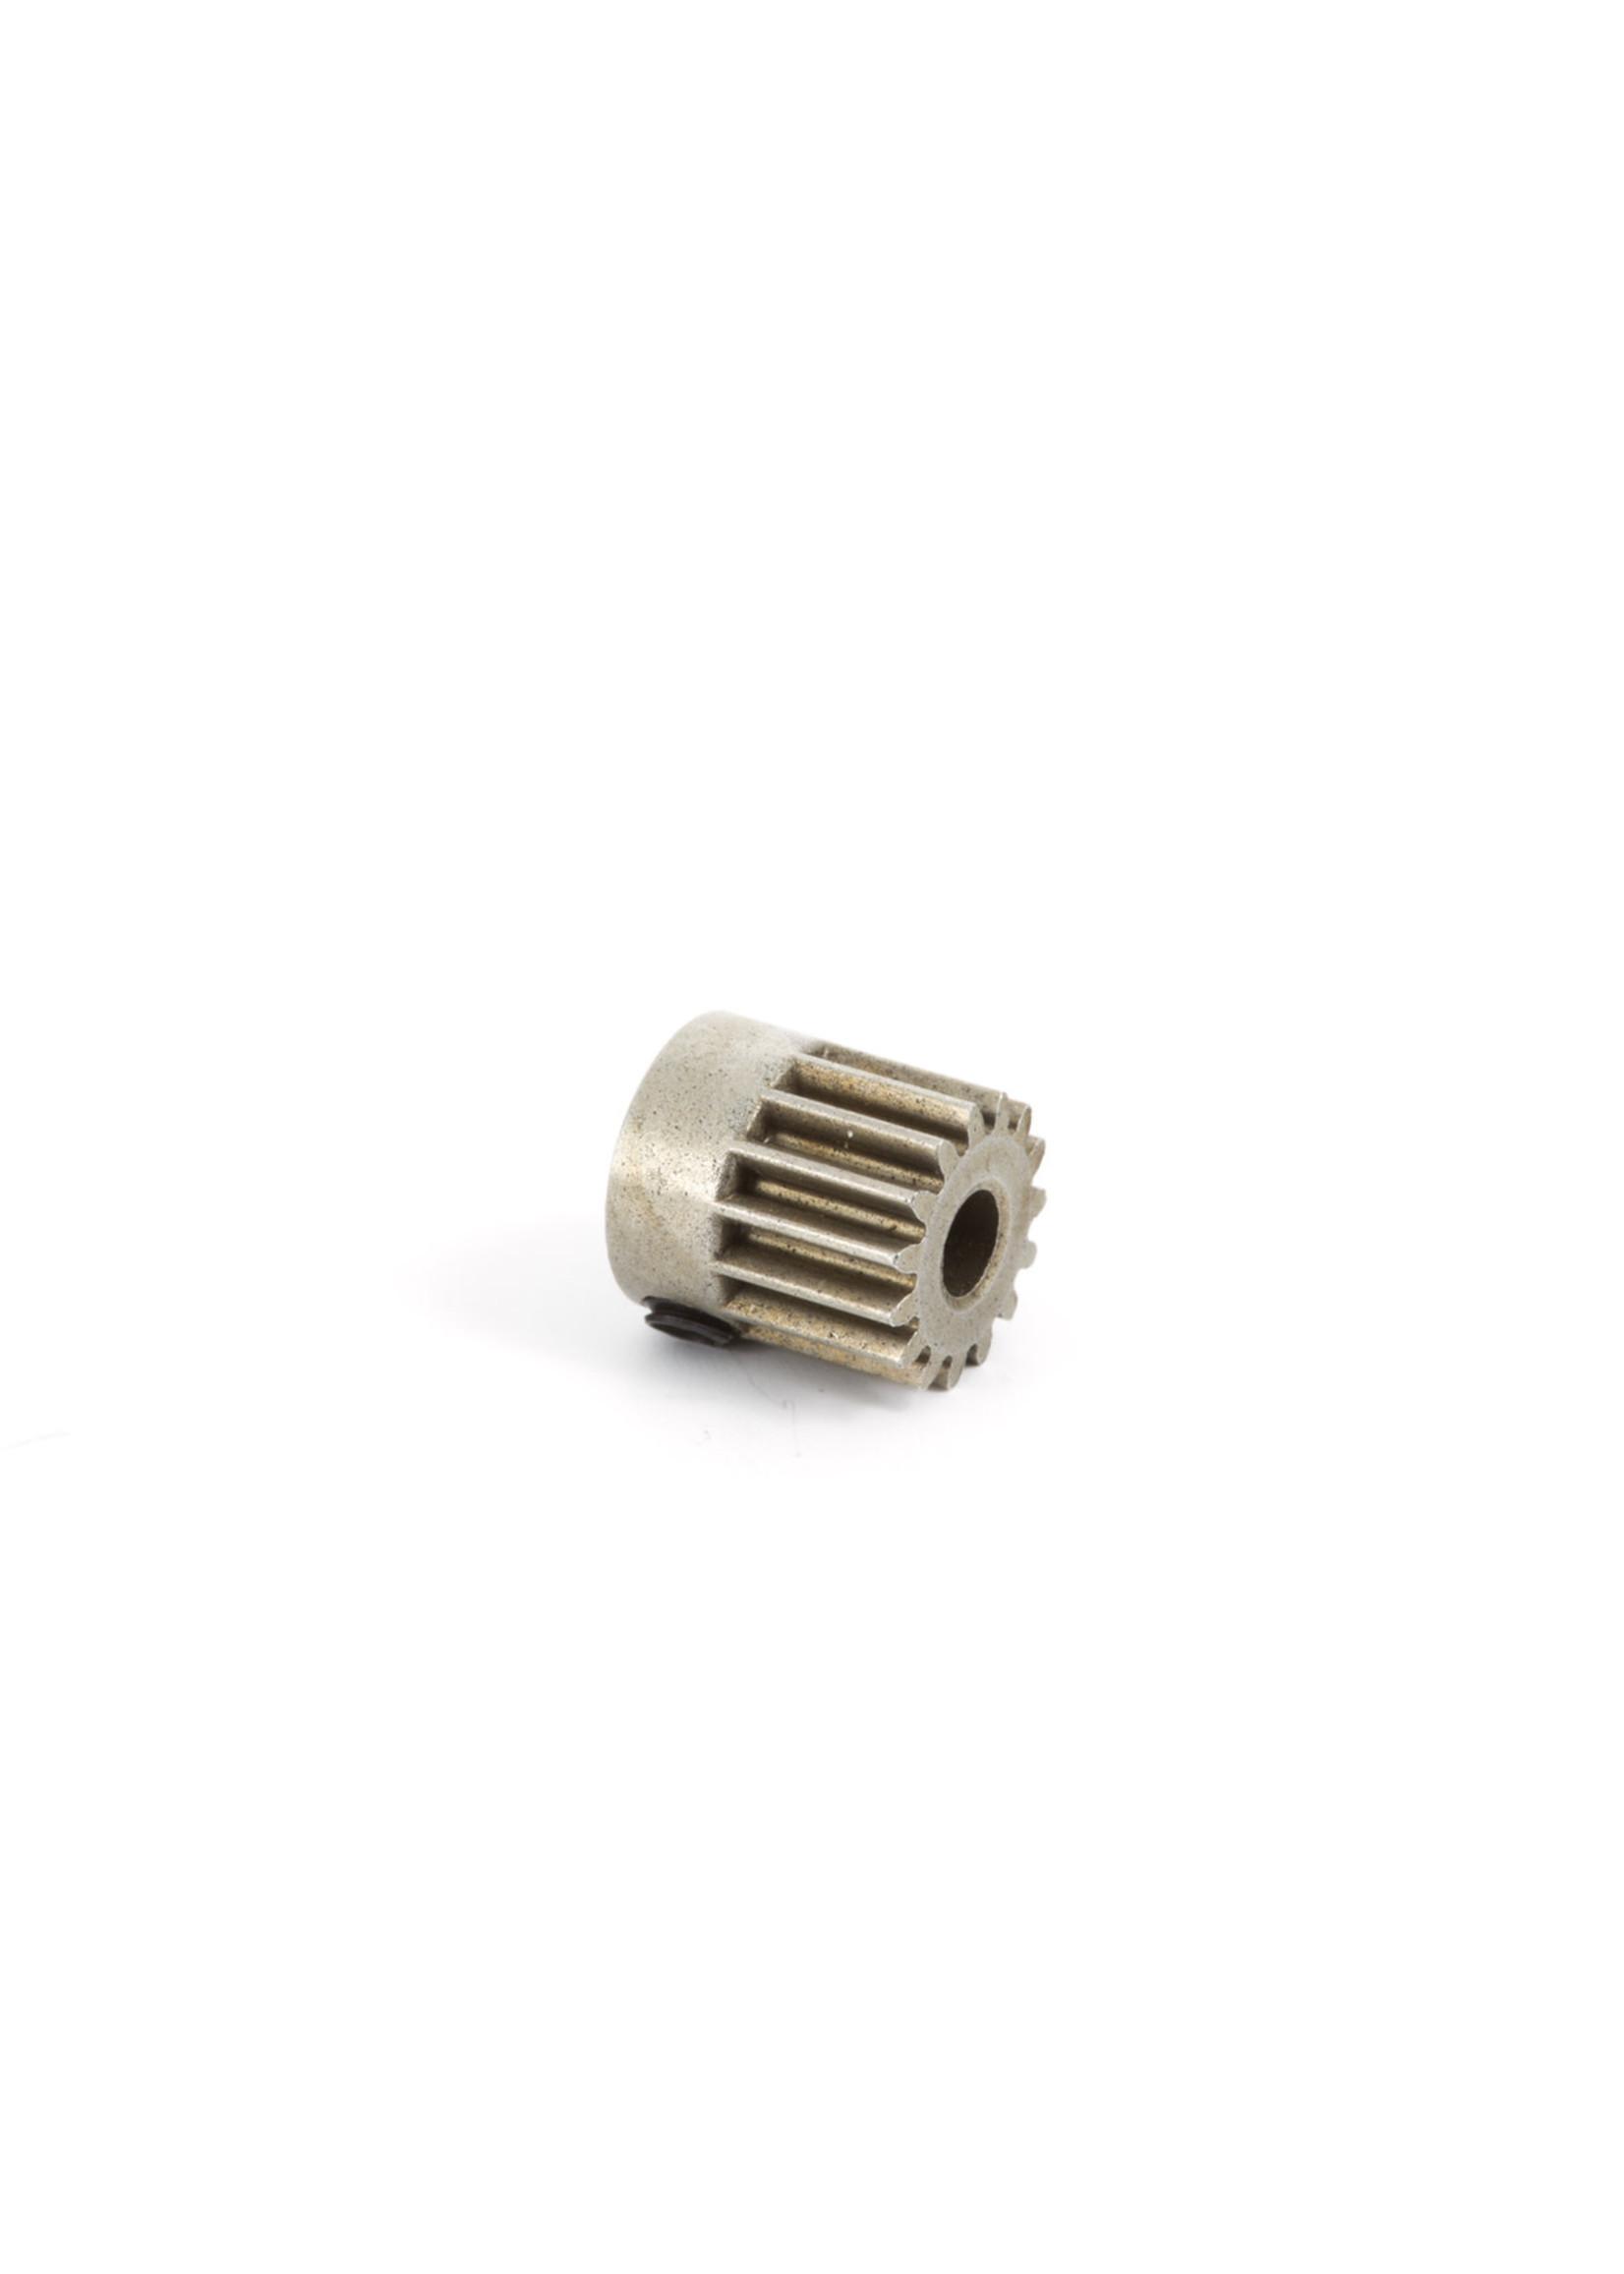 ARRMA AR310372 Arrma Pinion Gear 48P 15T